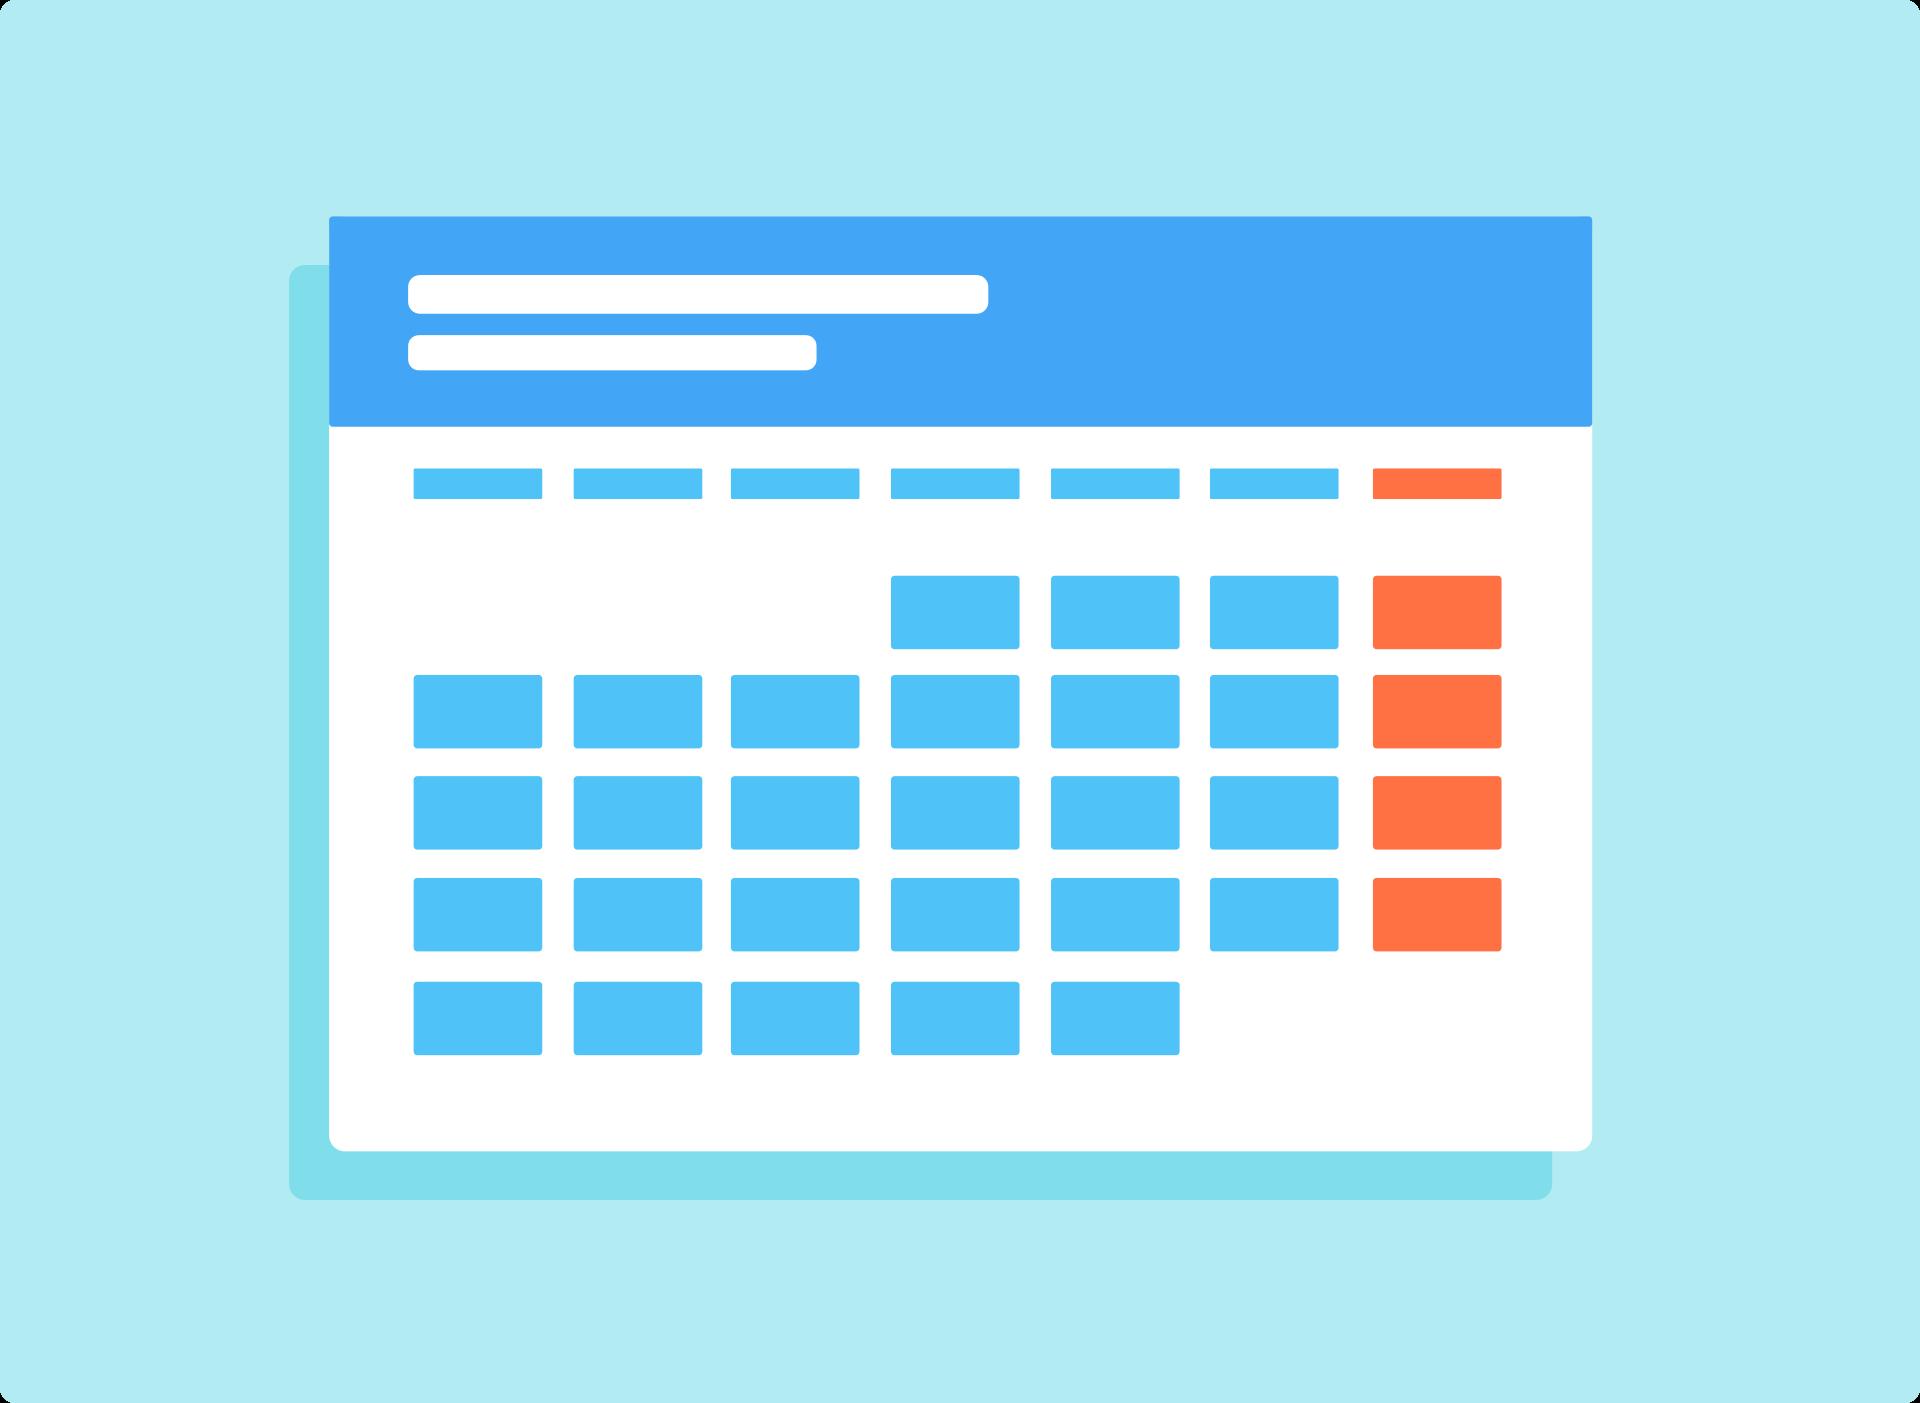 calendar-1763587